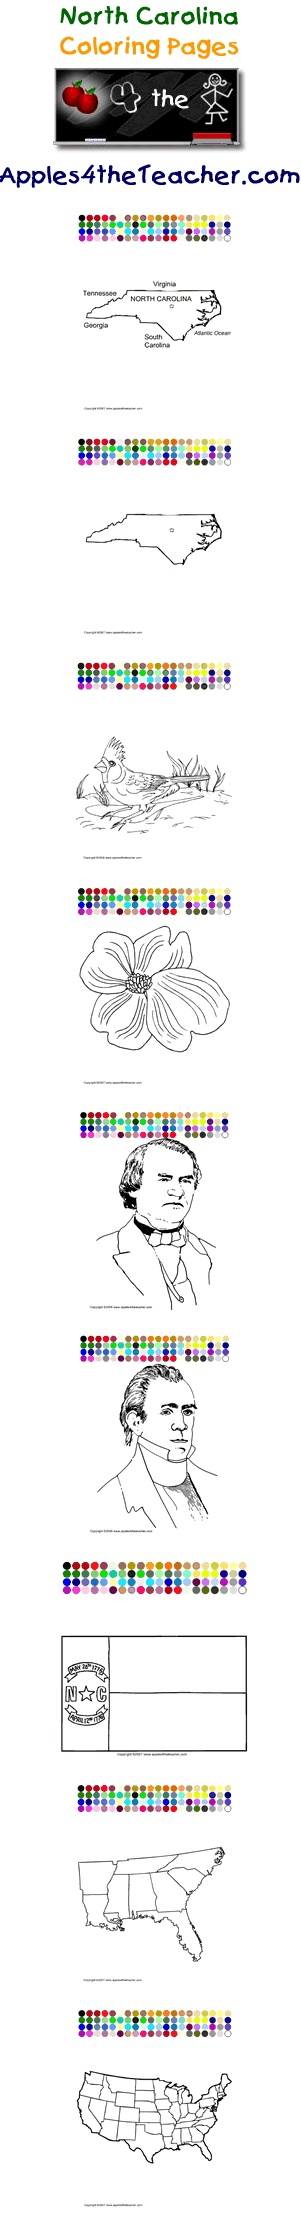 apples4theteacher com coloring pages - 17 best images about symbols on pinterest crafts